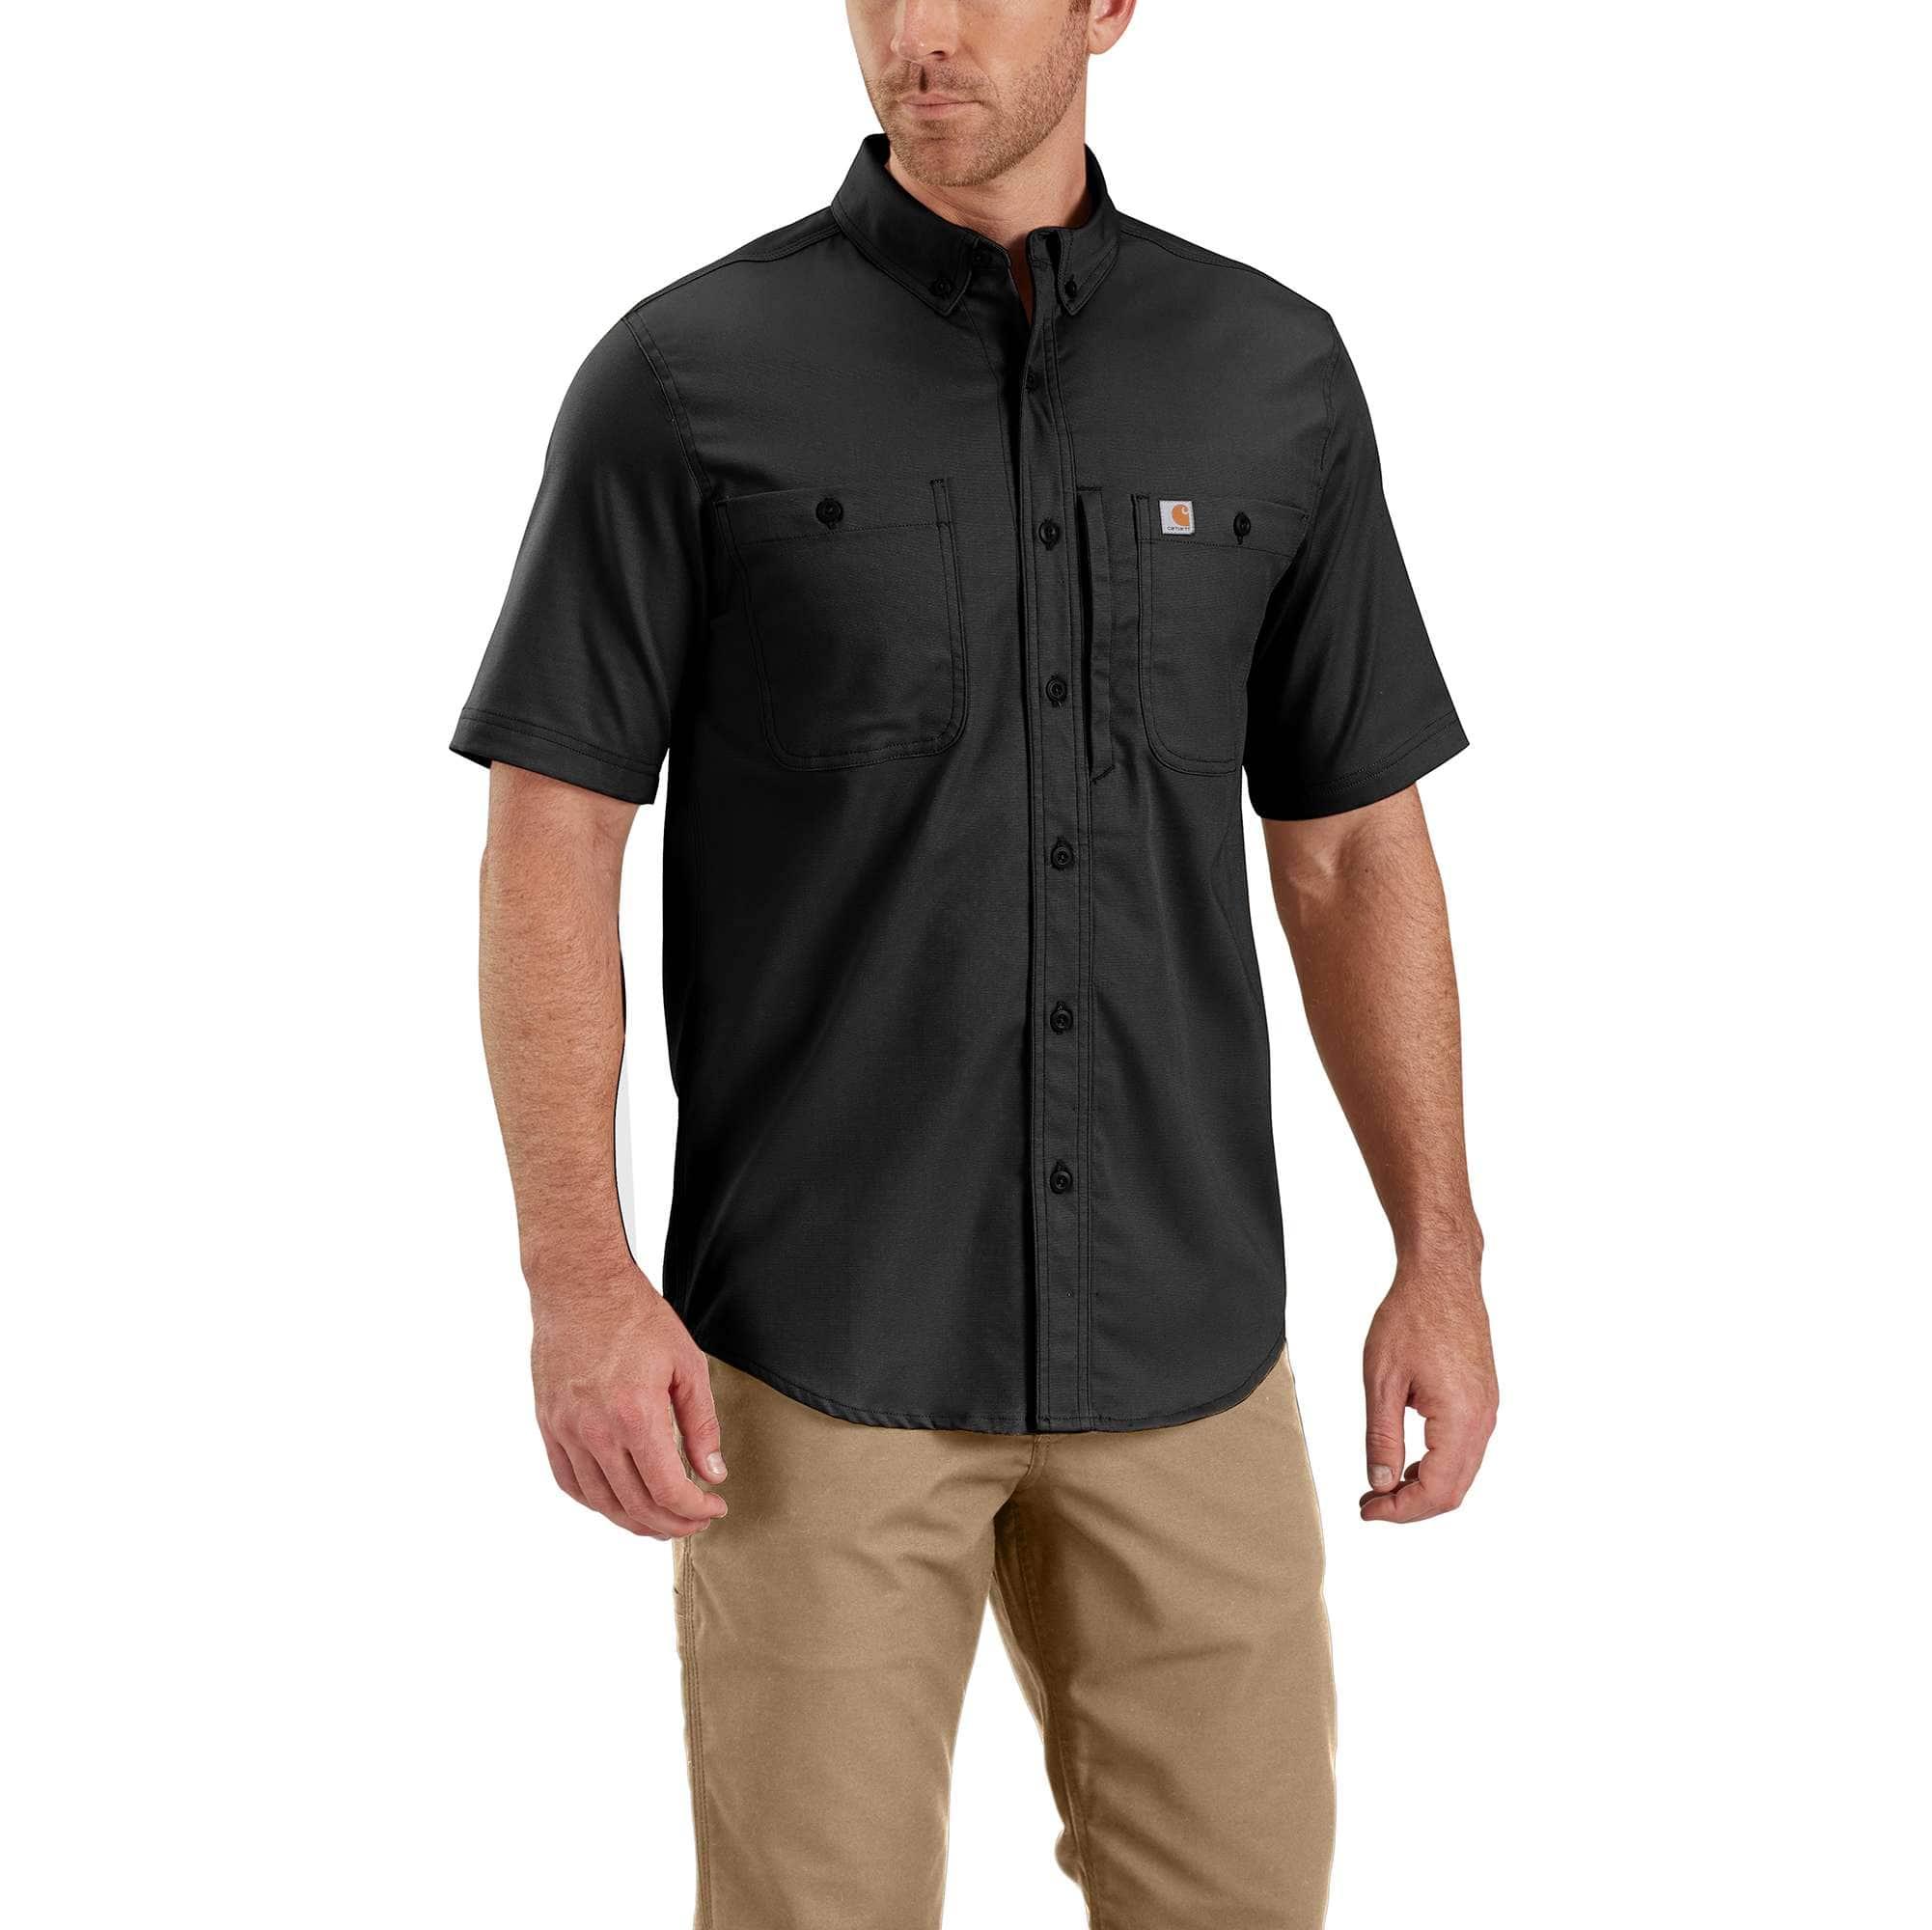 Carhartt Mens Big /& Tall Rugged Professional Long Sleeve Work Shirt Work Utility Button Down Shirt